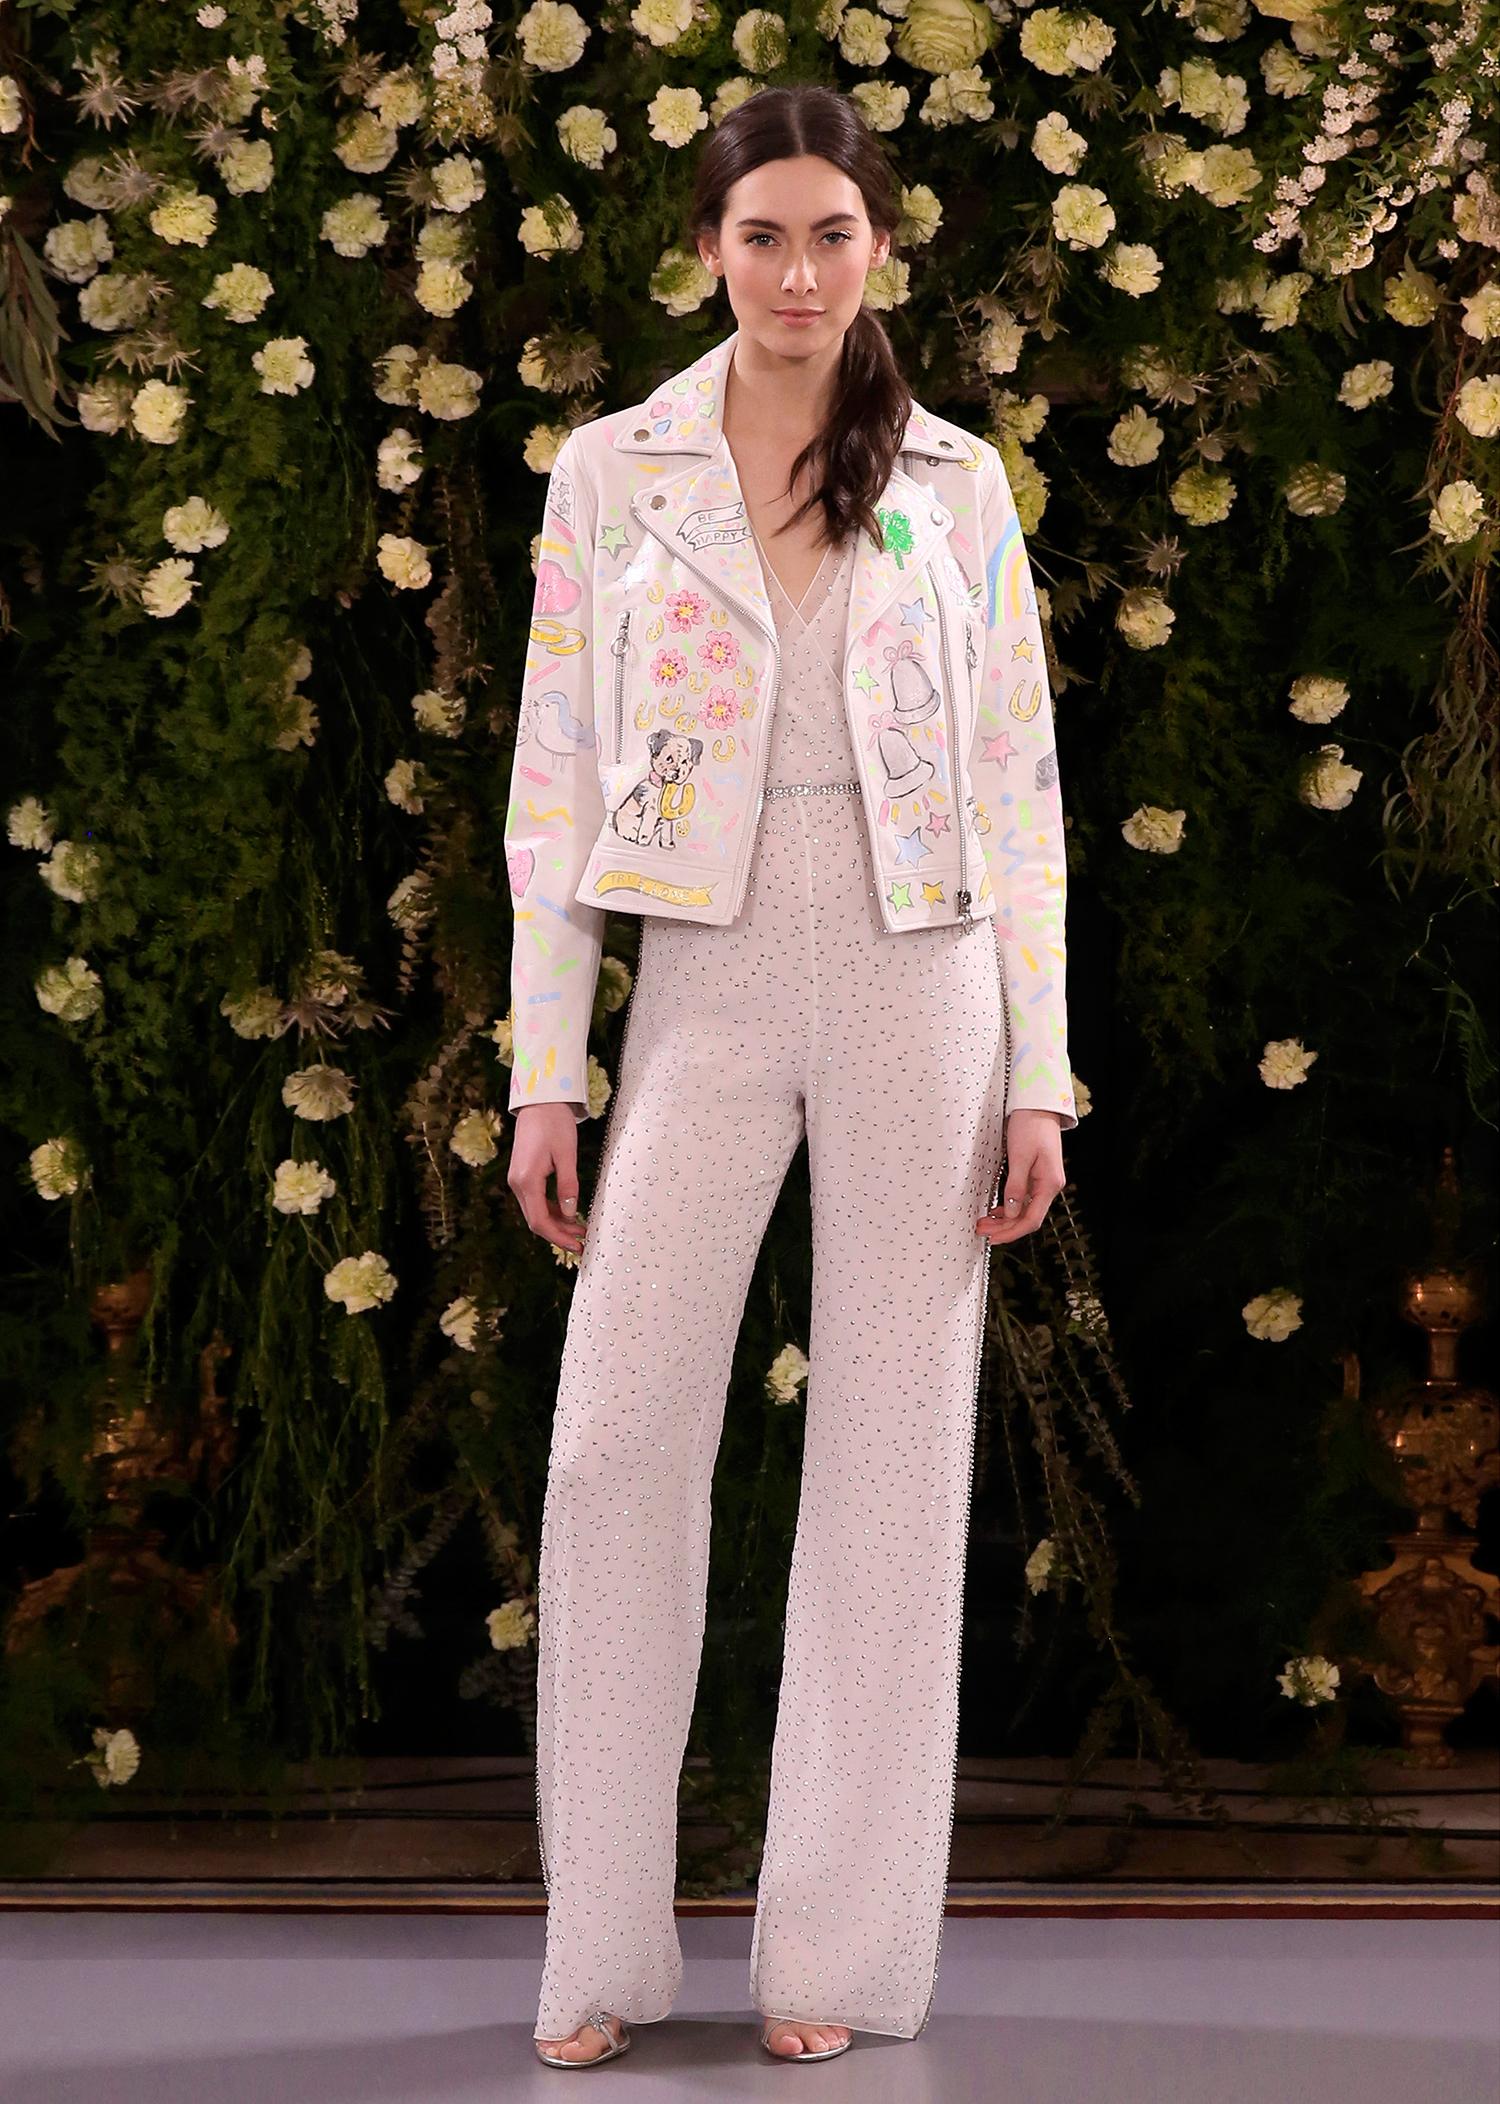 jenny packham wedding dress spring 2019 jumpsuit with embellished jacket